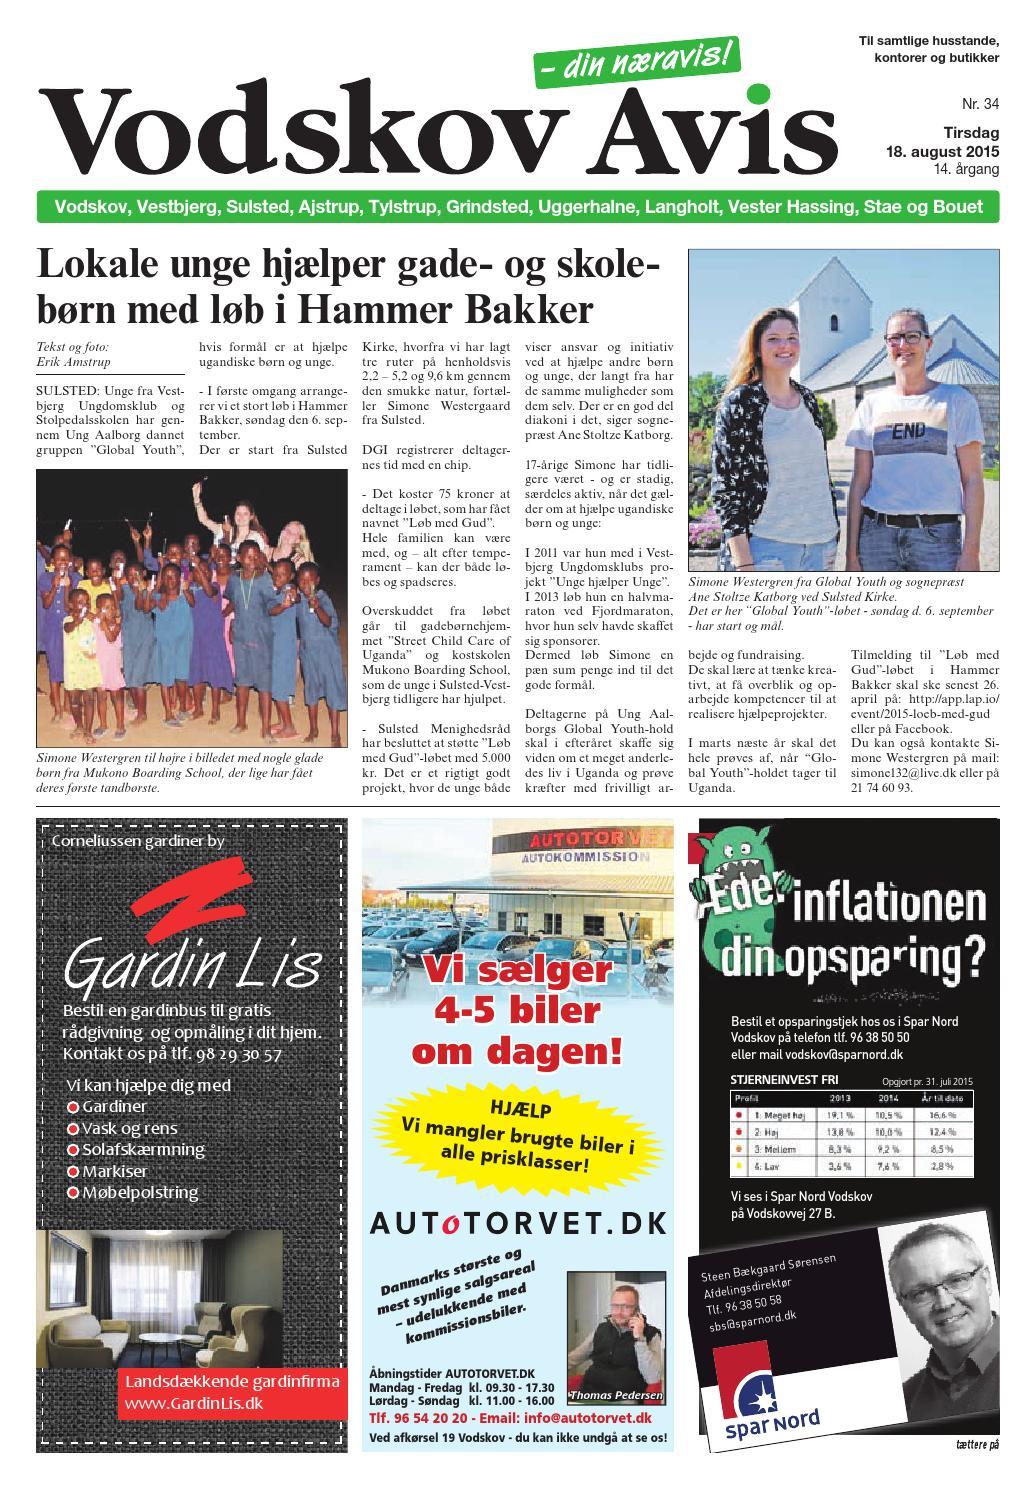 Vodskov avis nr 34 2015 by vodskov avis issuu